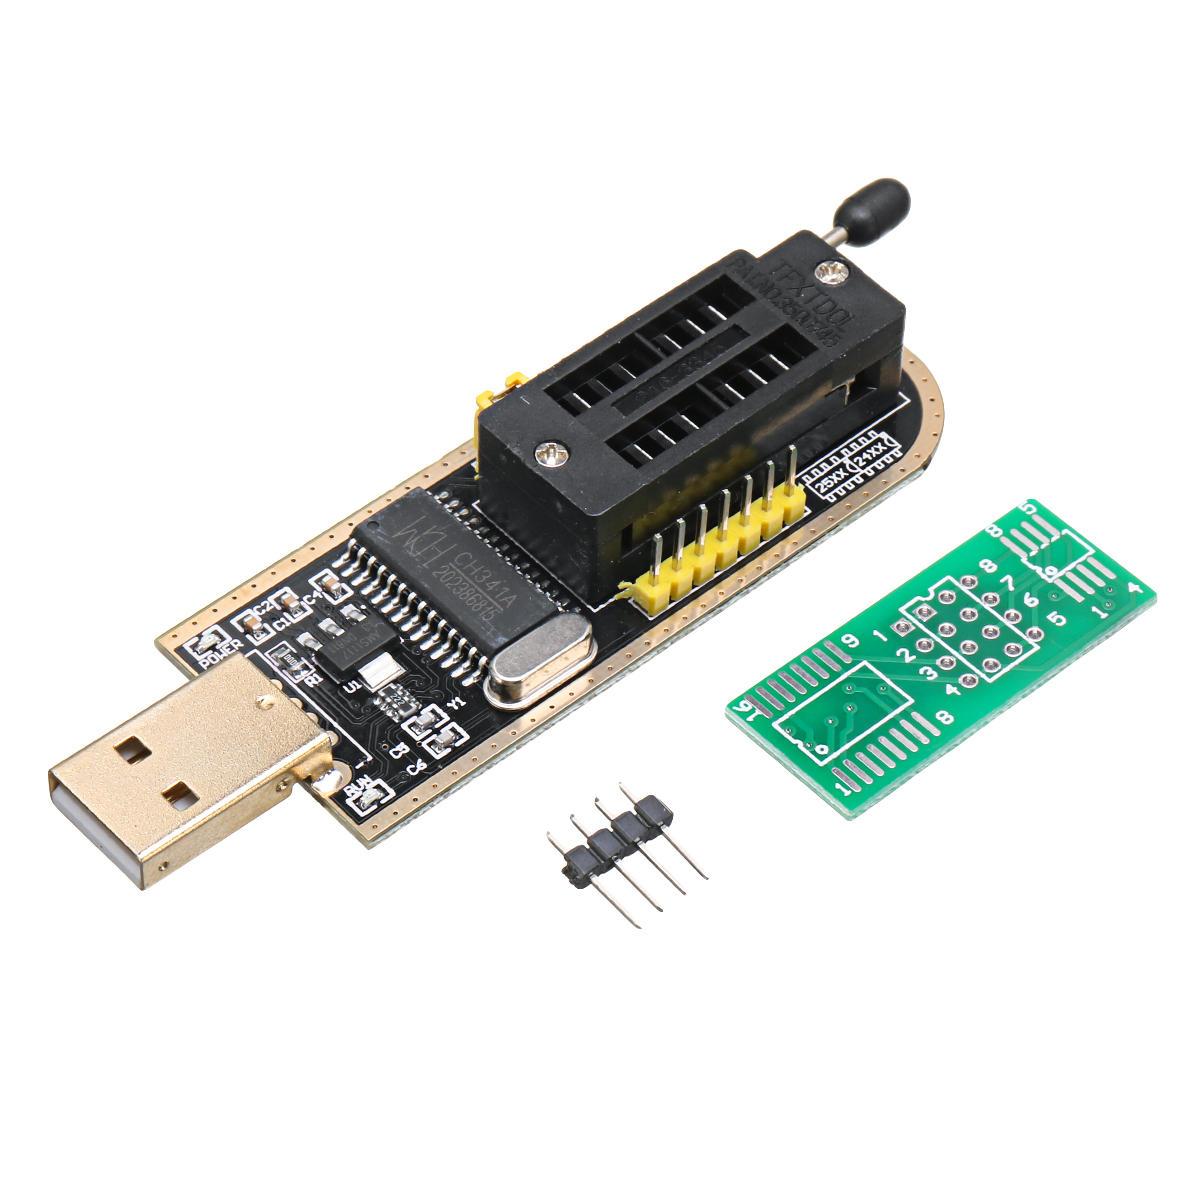 SPI FLASH BIOS USB Programmer Writer Burner 24 25 Serie USB To TTL CH341A